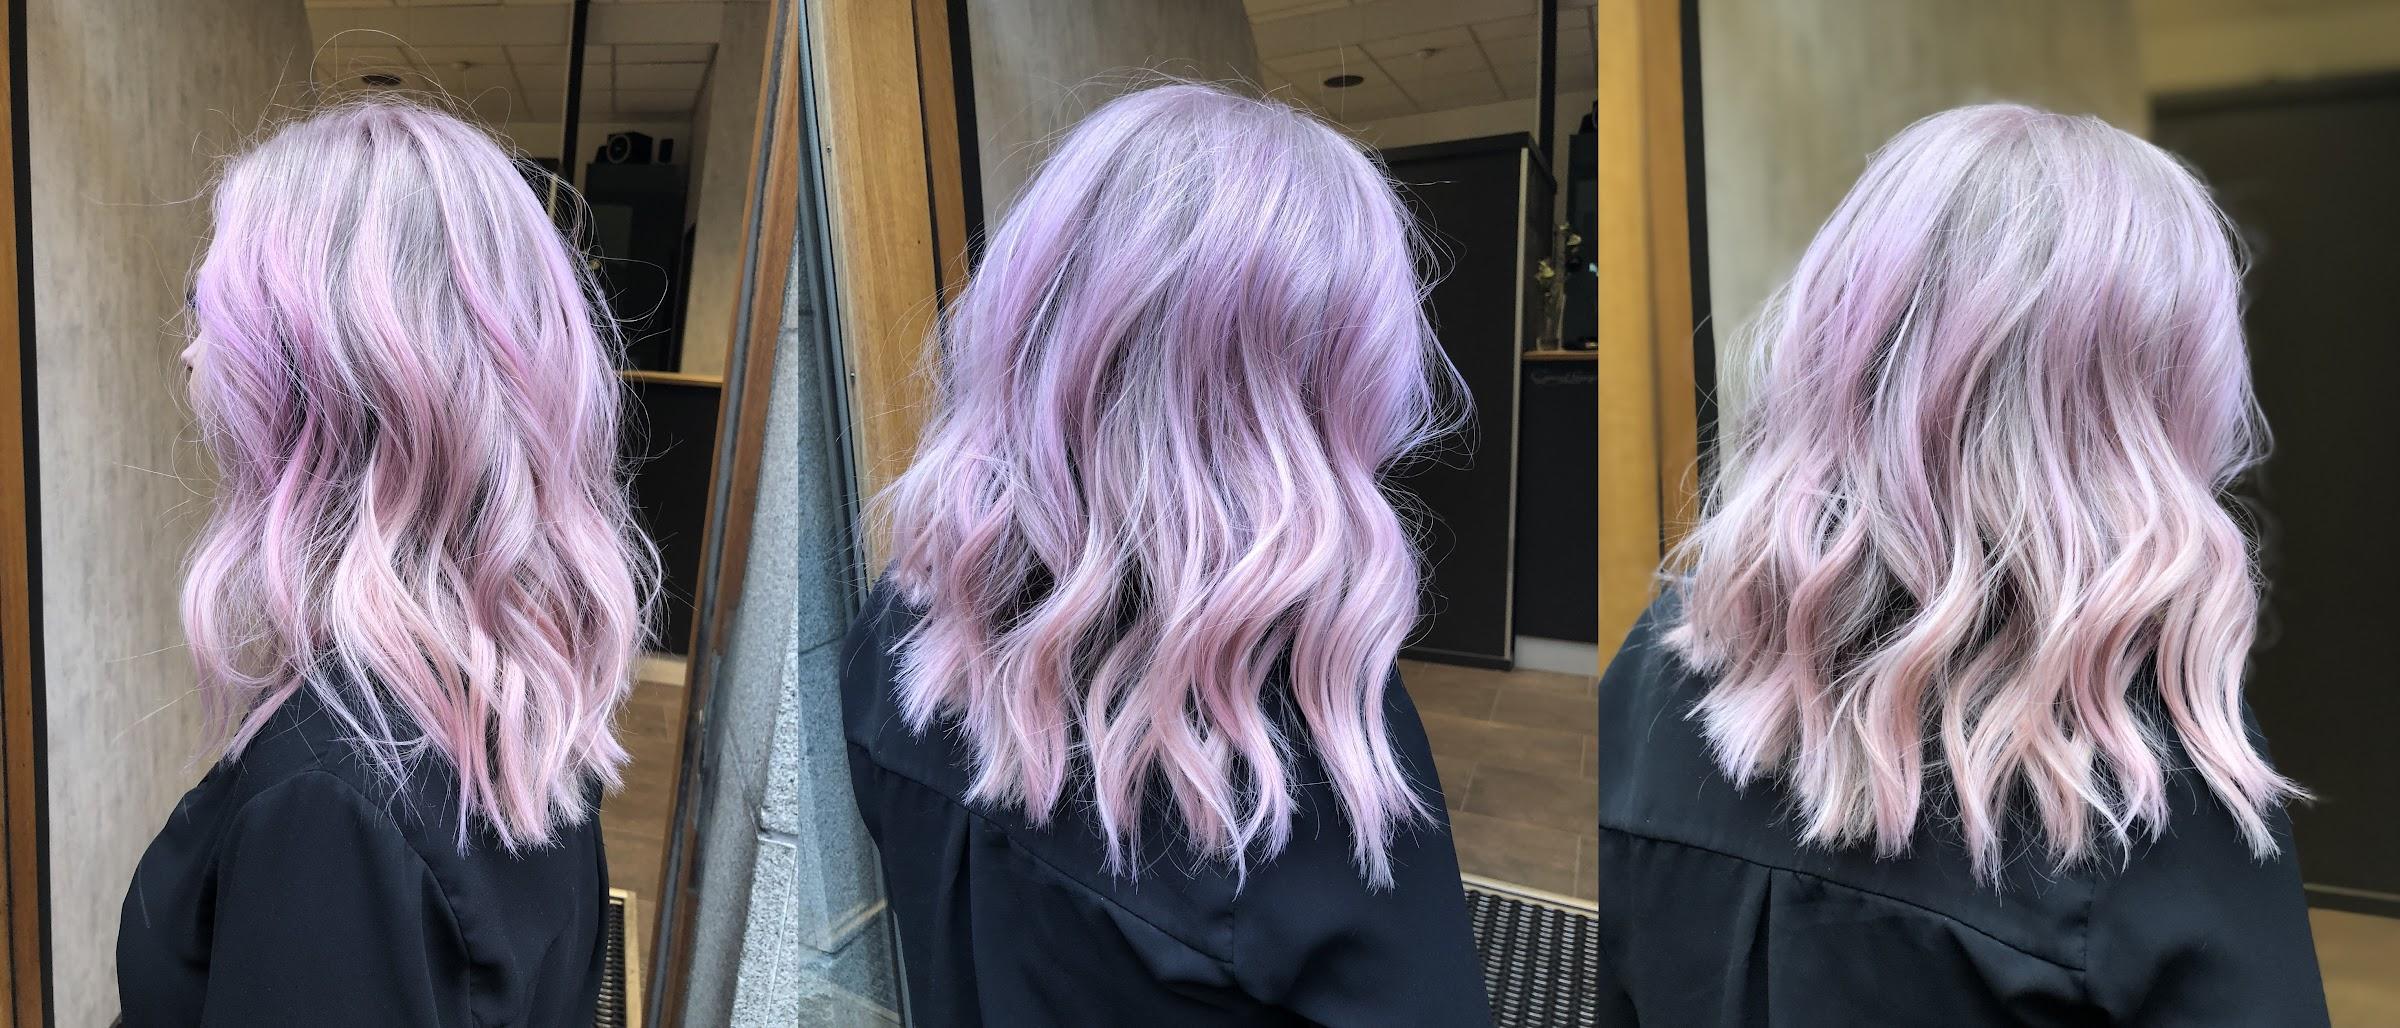 rosa hårfärg göteborg